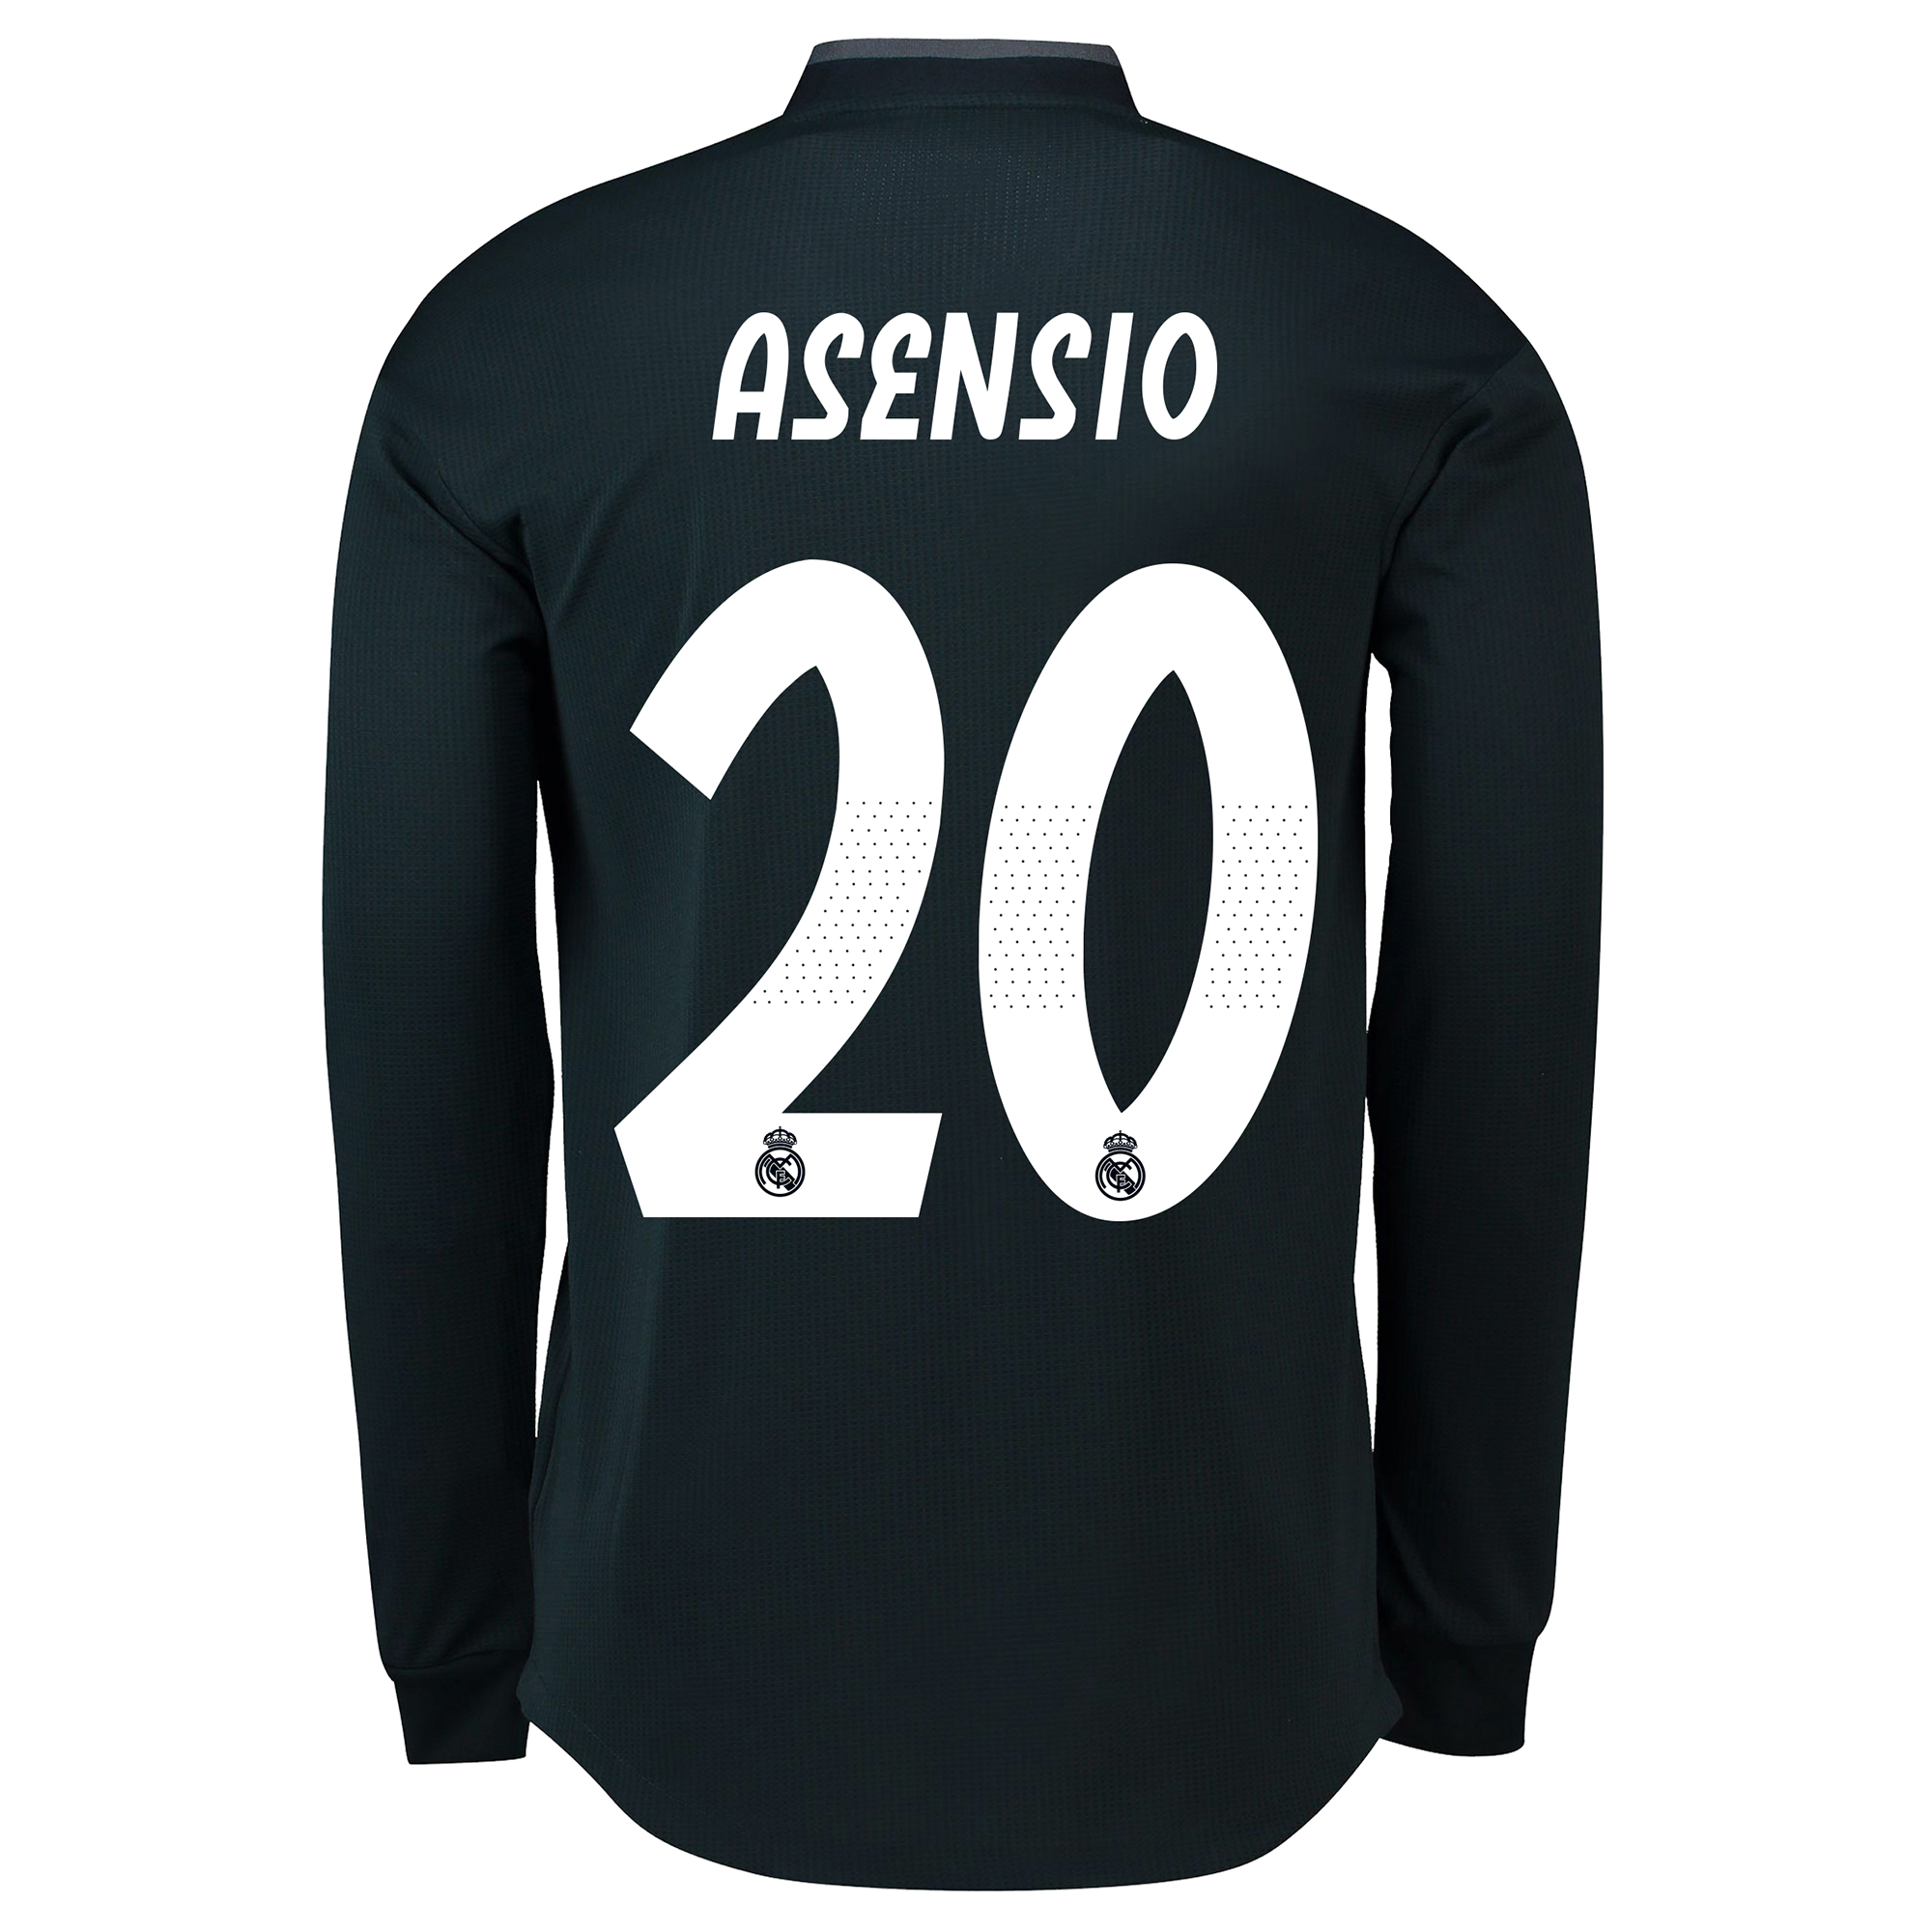 Image of Real Madrid Away Adi Zero Shirt 2018-19 - Long Sleeve with Asensio 20 printing